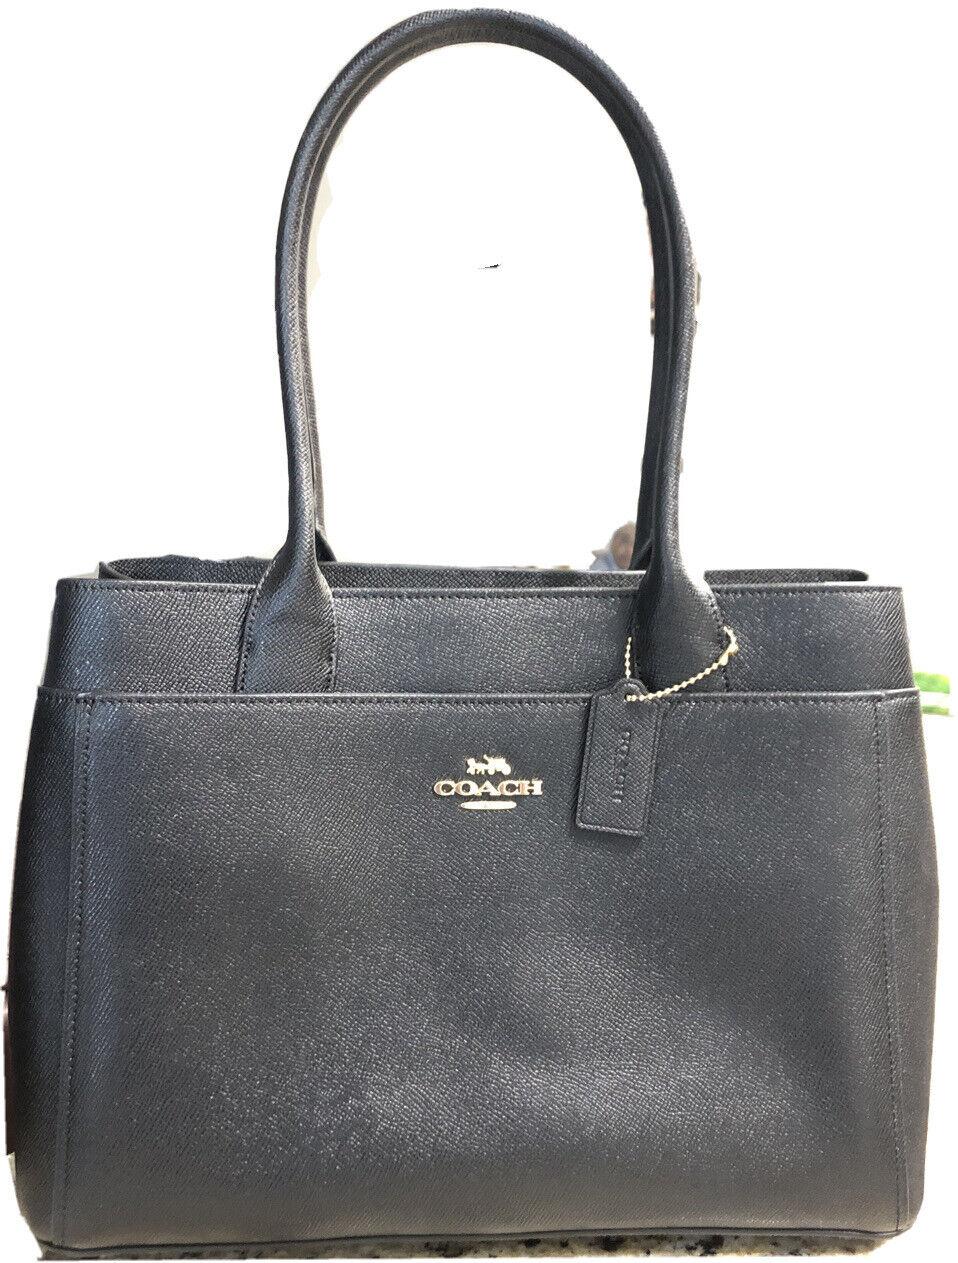 New Coach F31474 Casey Tote Crossgrain Leather handbag Black $398